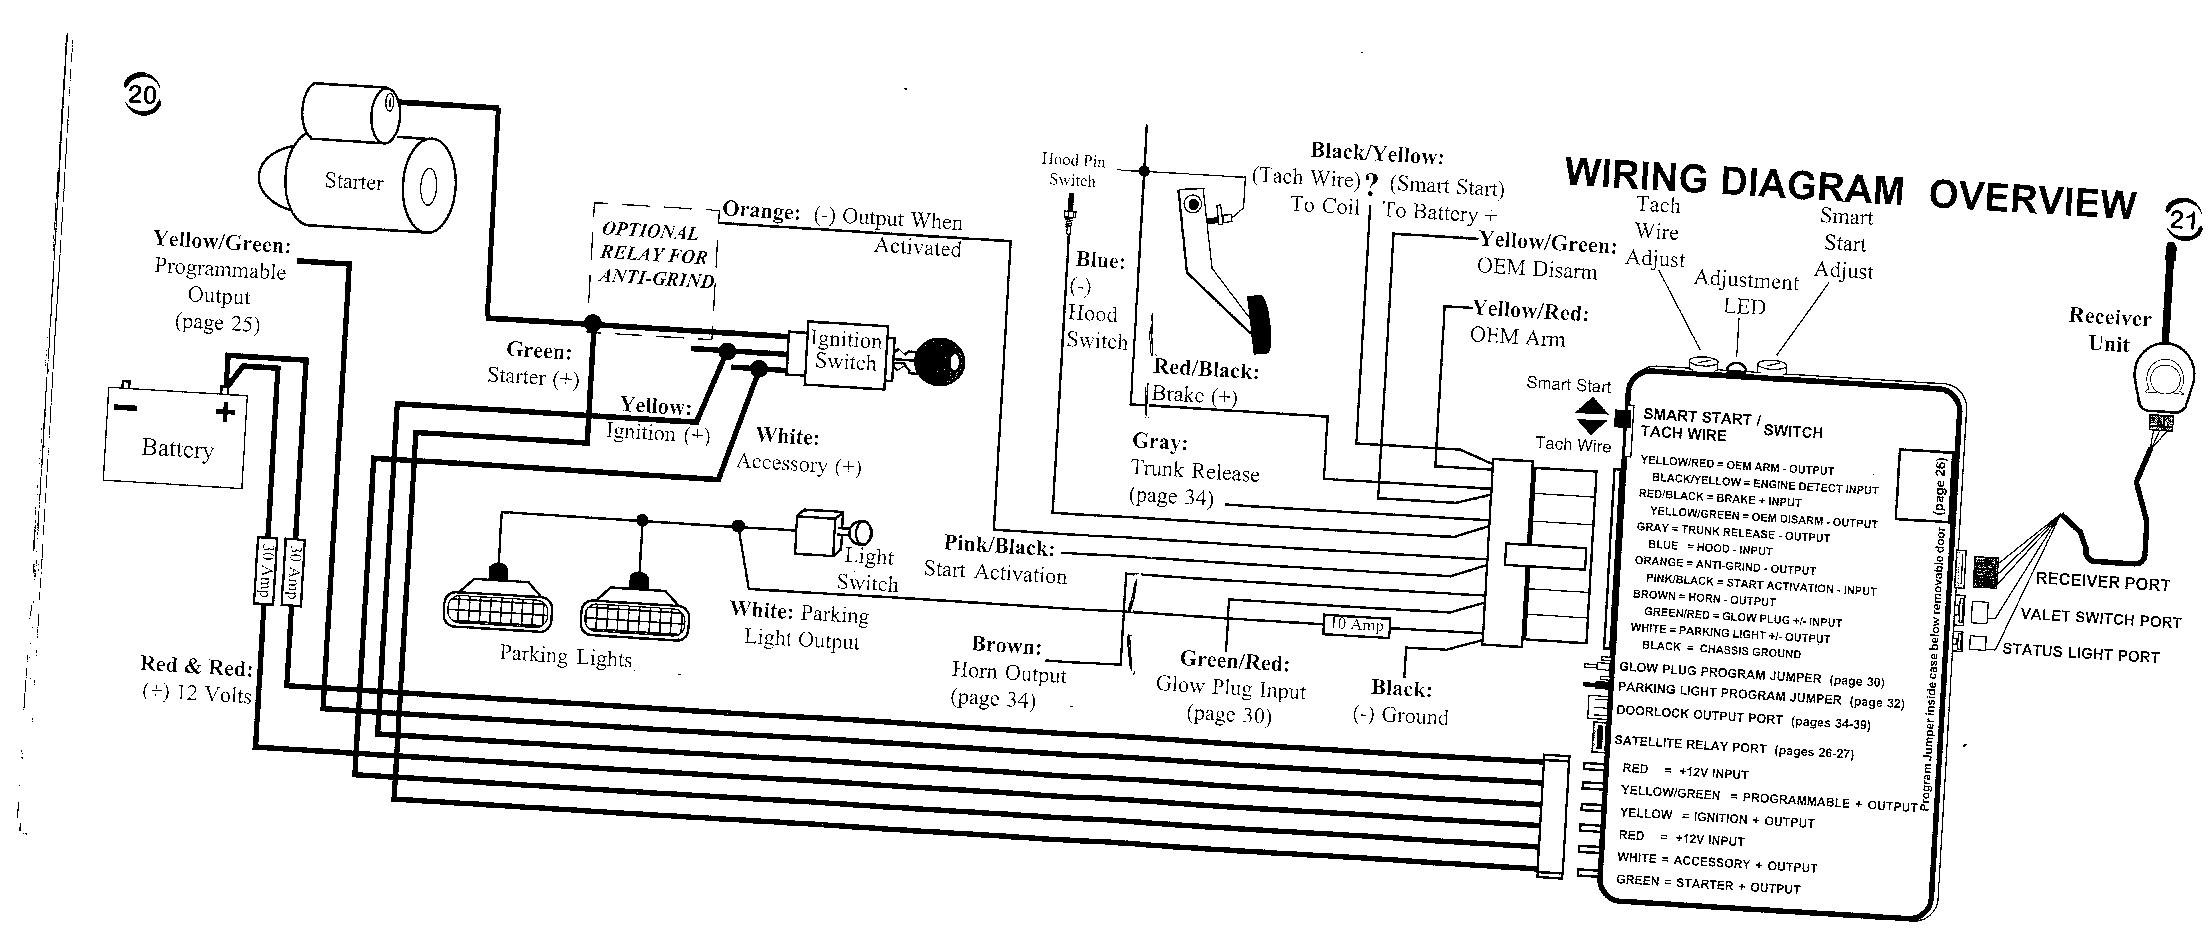 Viper 5901 Wiring Diagram from lh5.googleusercontent.com